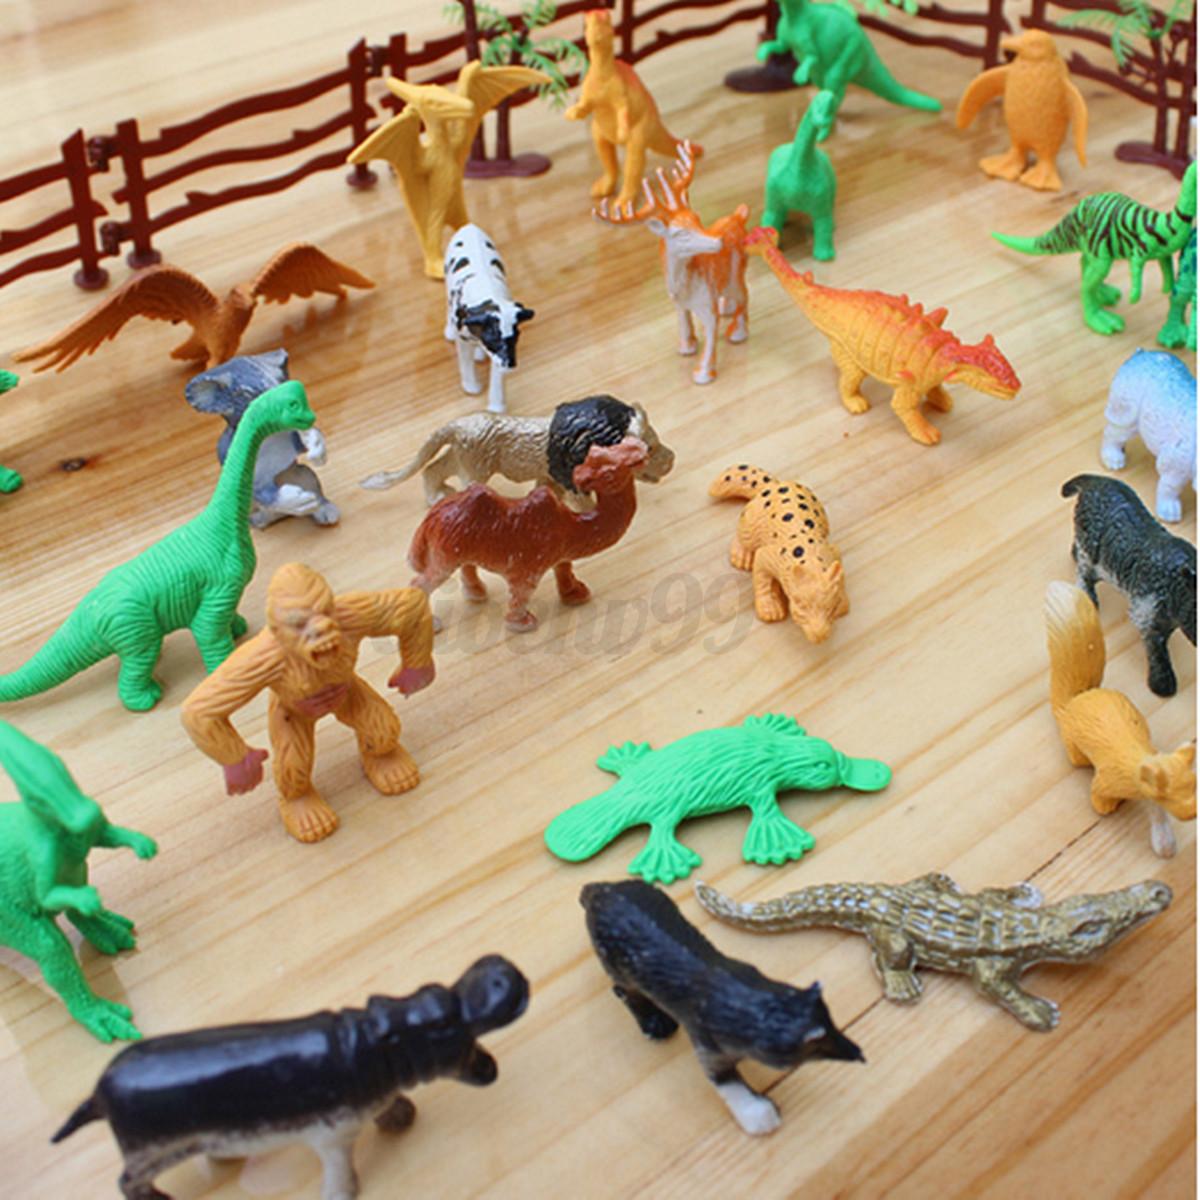 8 Toys Yeards : Pcs farm yard wild fence tree animals model kids toys